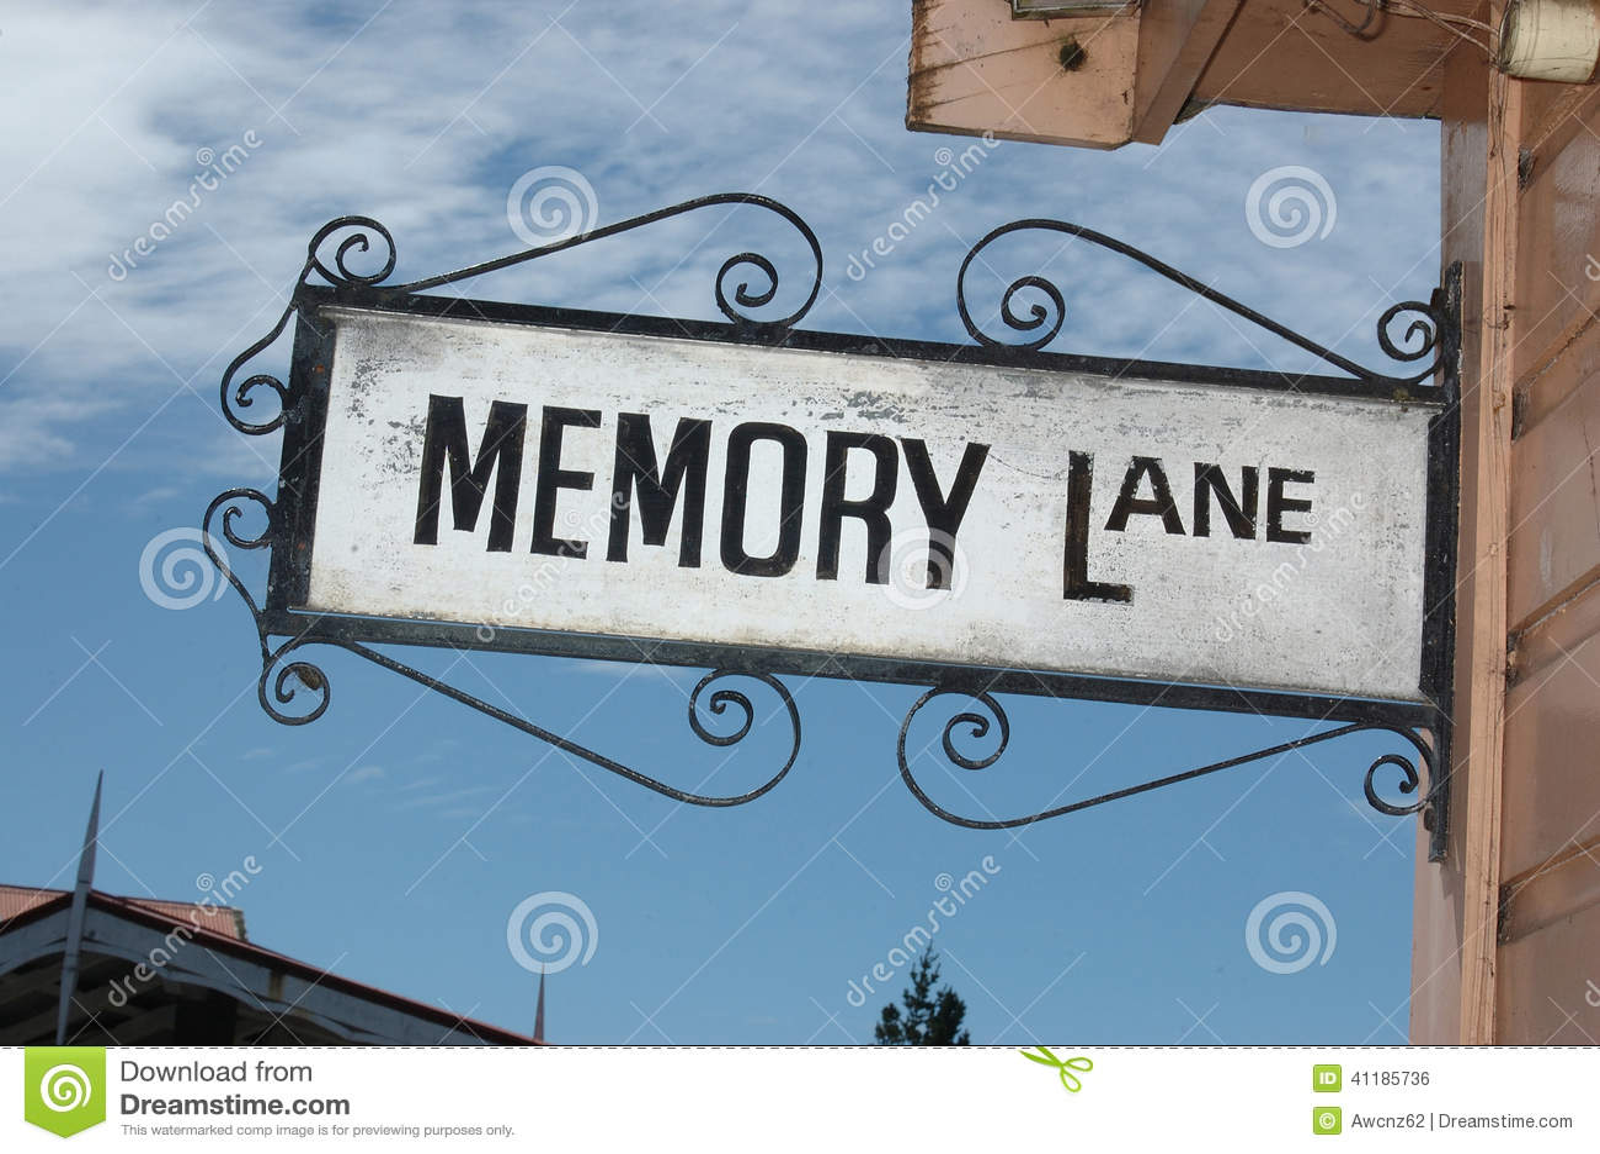 memory lane sign stock photo image 41185736. Black Bedroom Furniture Sets. Home Design Ideas